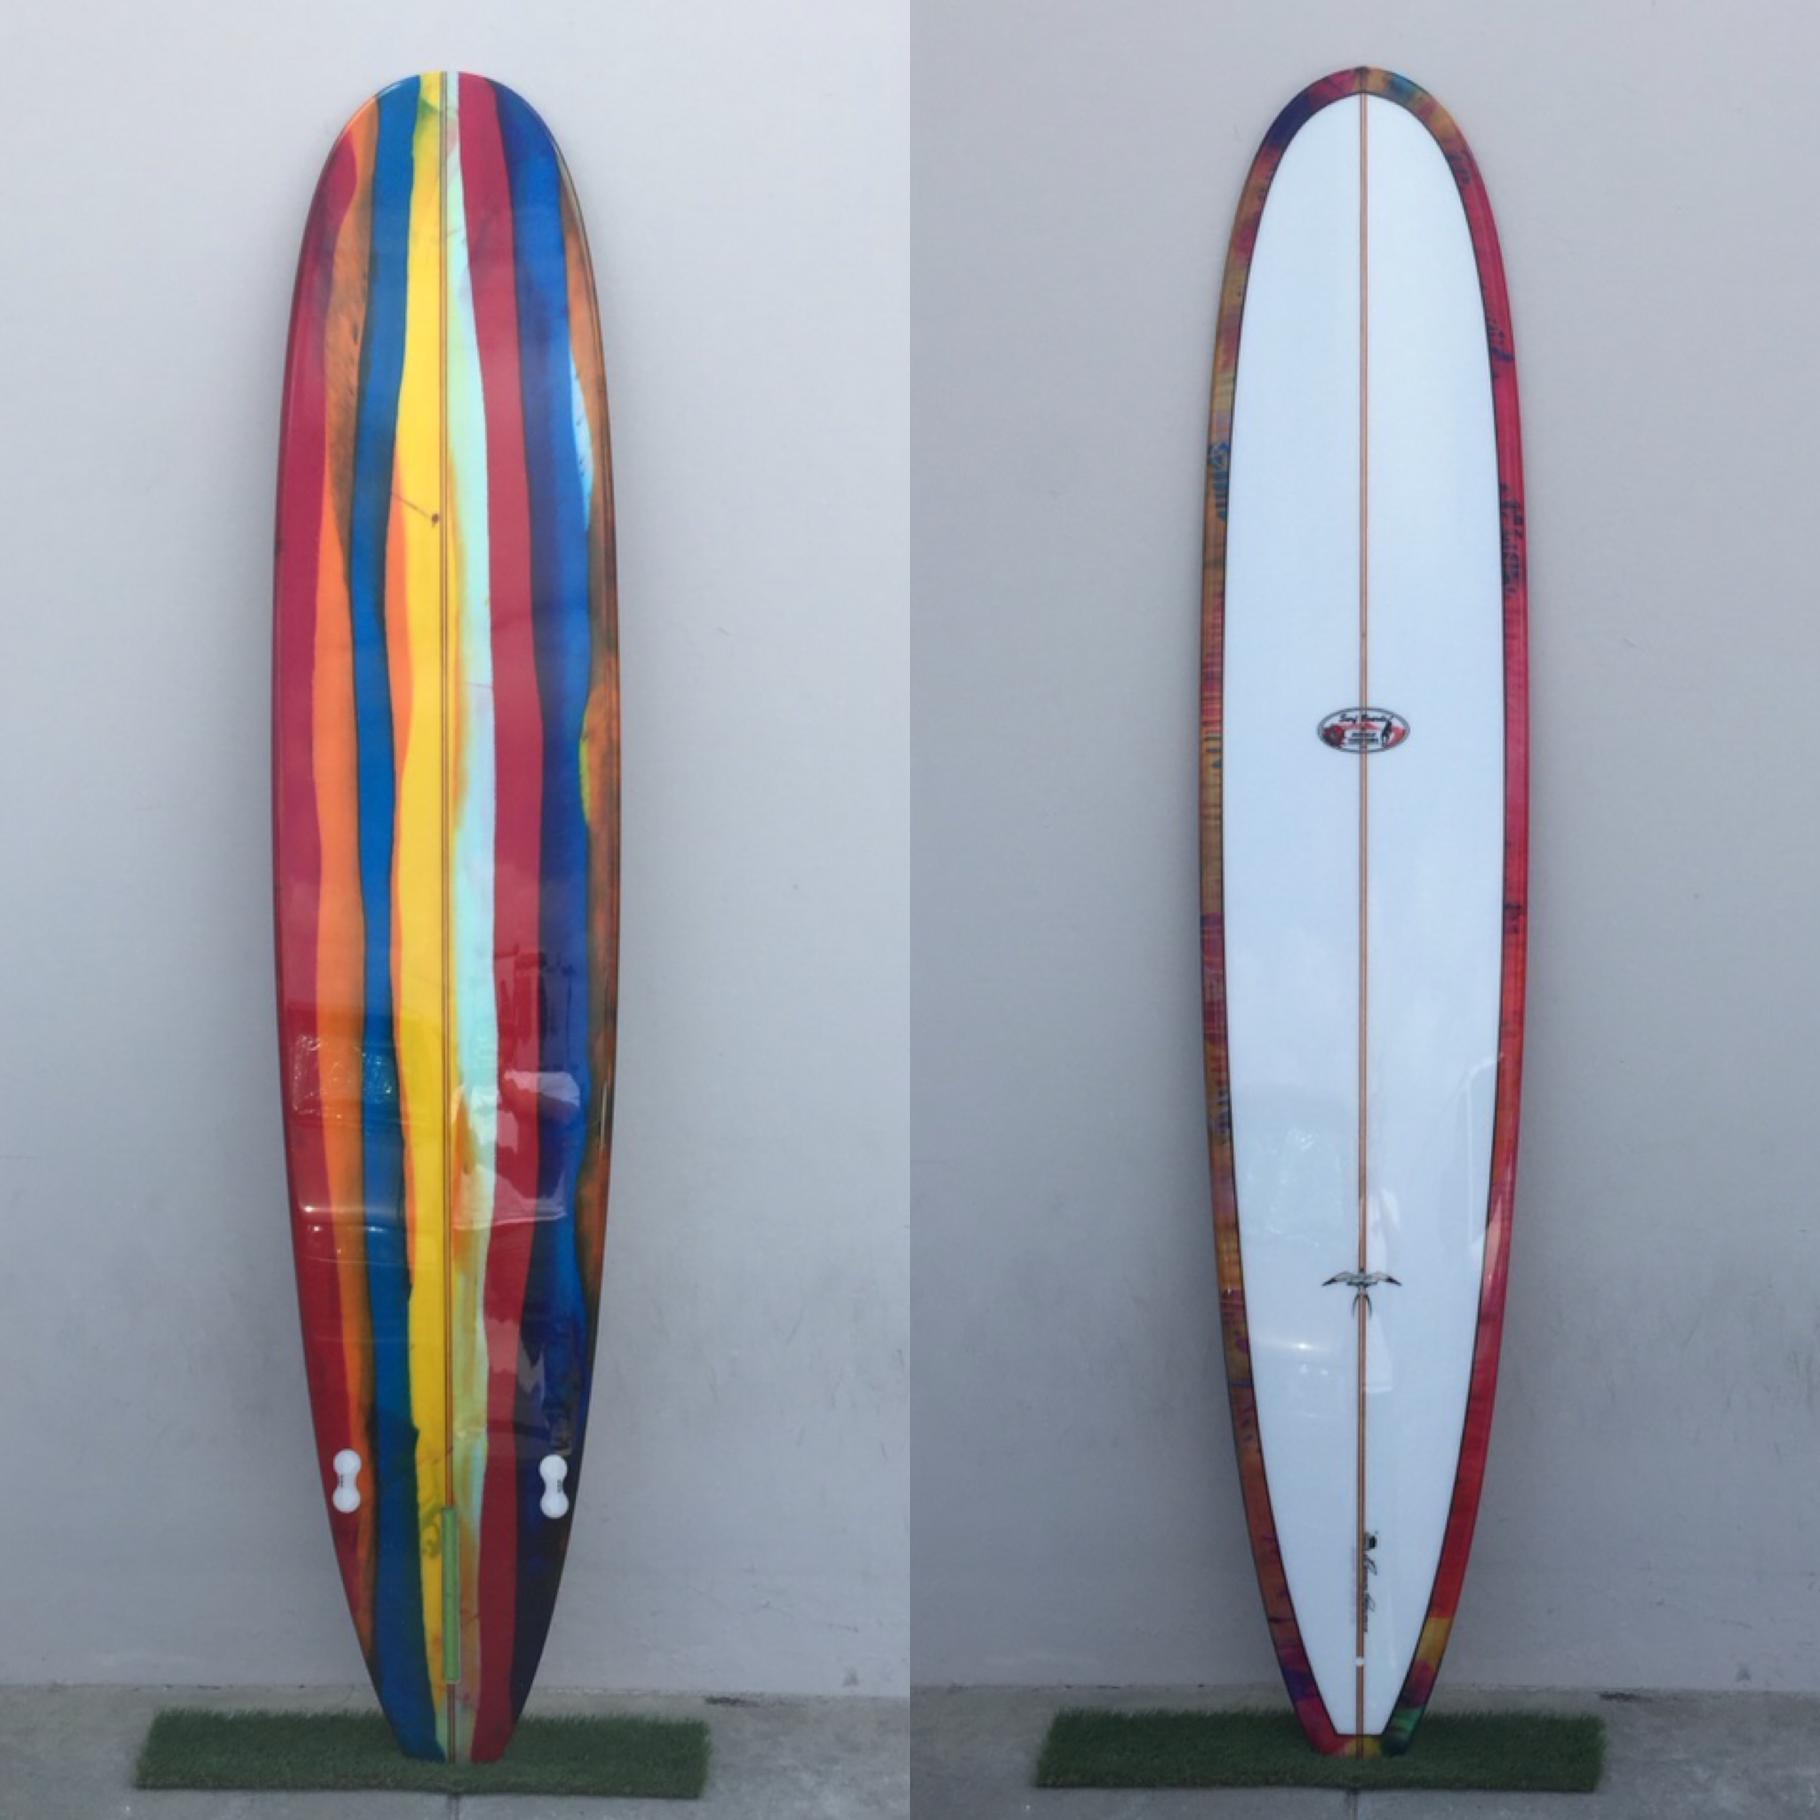 Noah Comp Surfboards By Donald Takayama